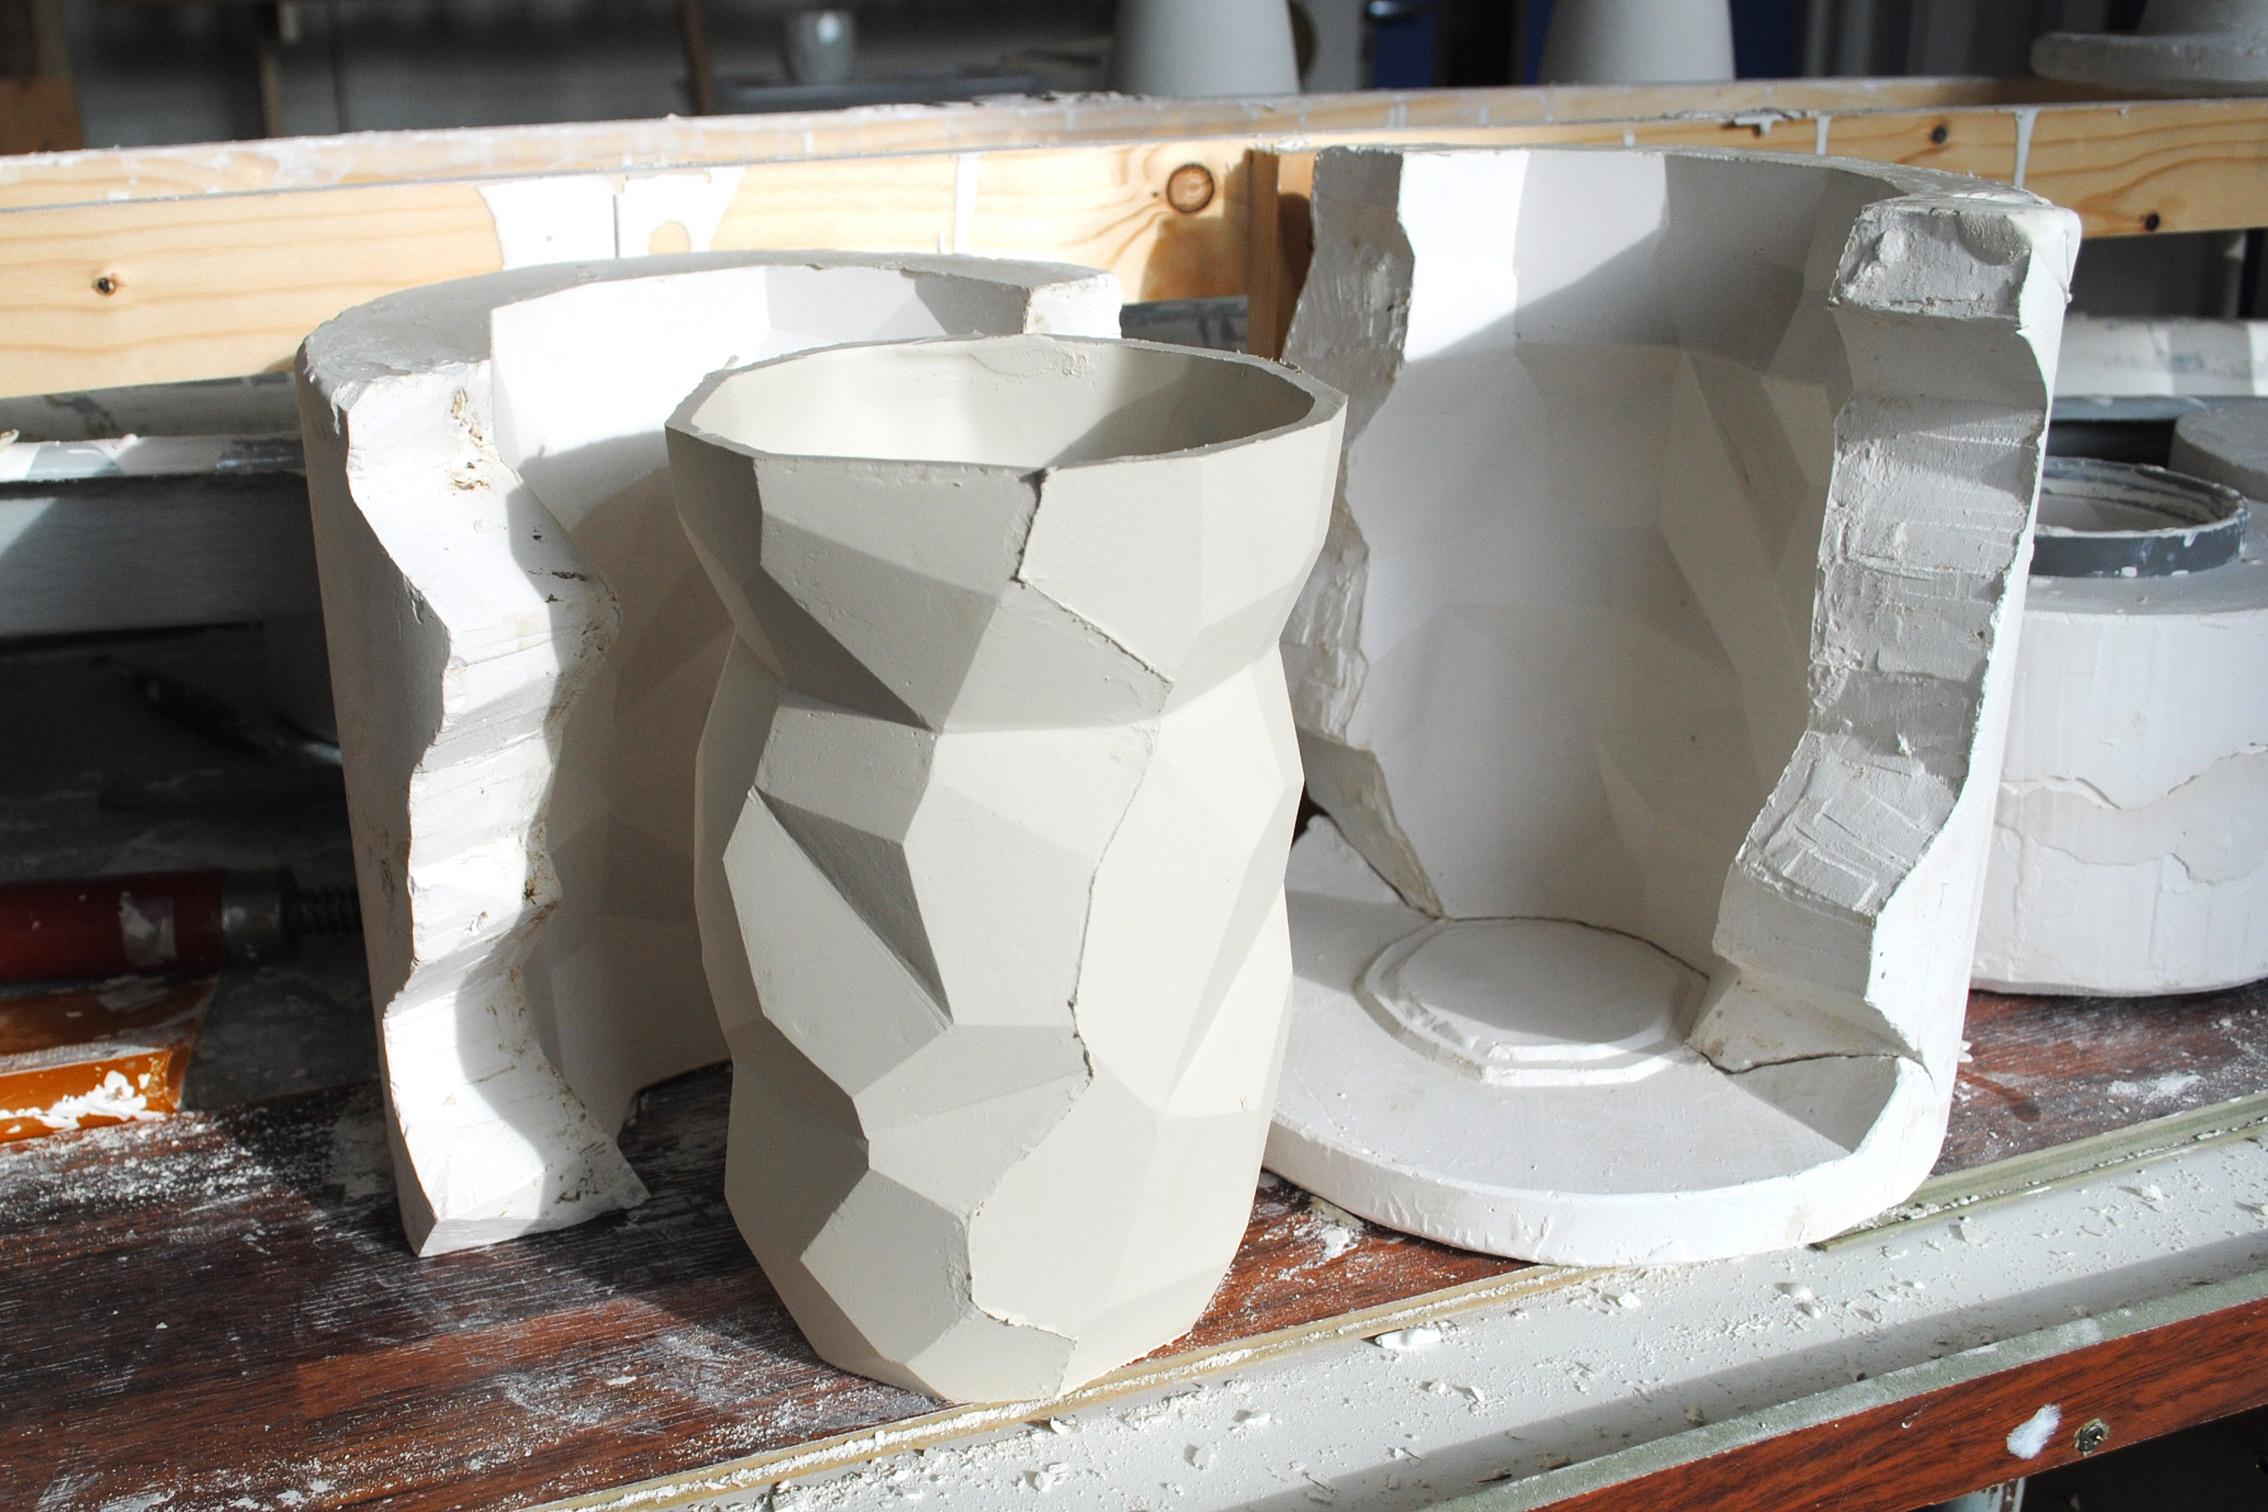 a10_mdba_mdby_manufactured_ceramics_design_studio_lorier_ production